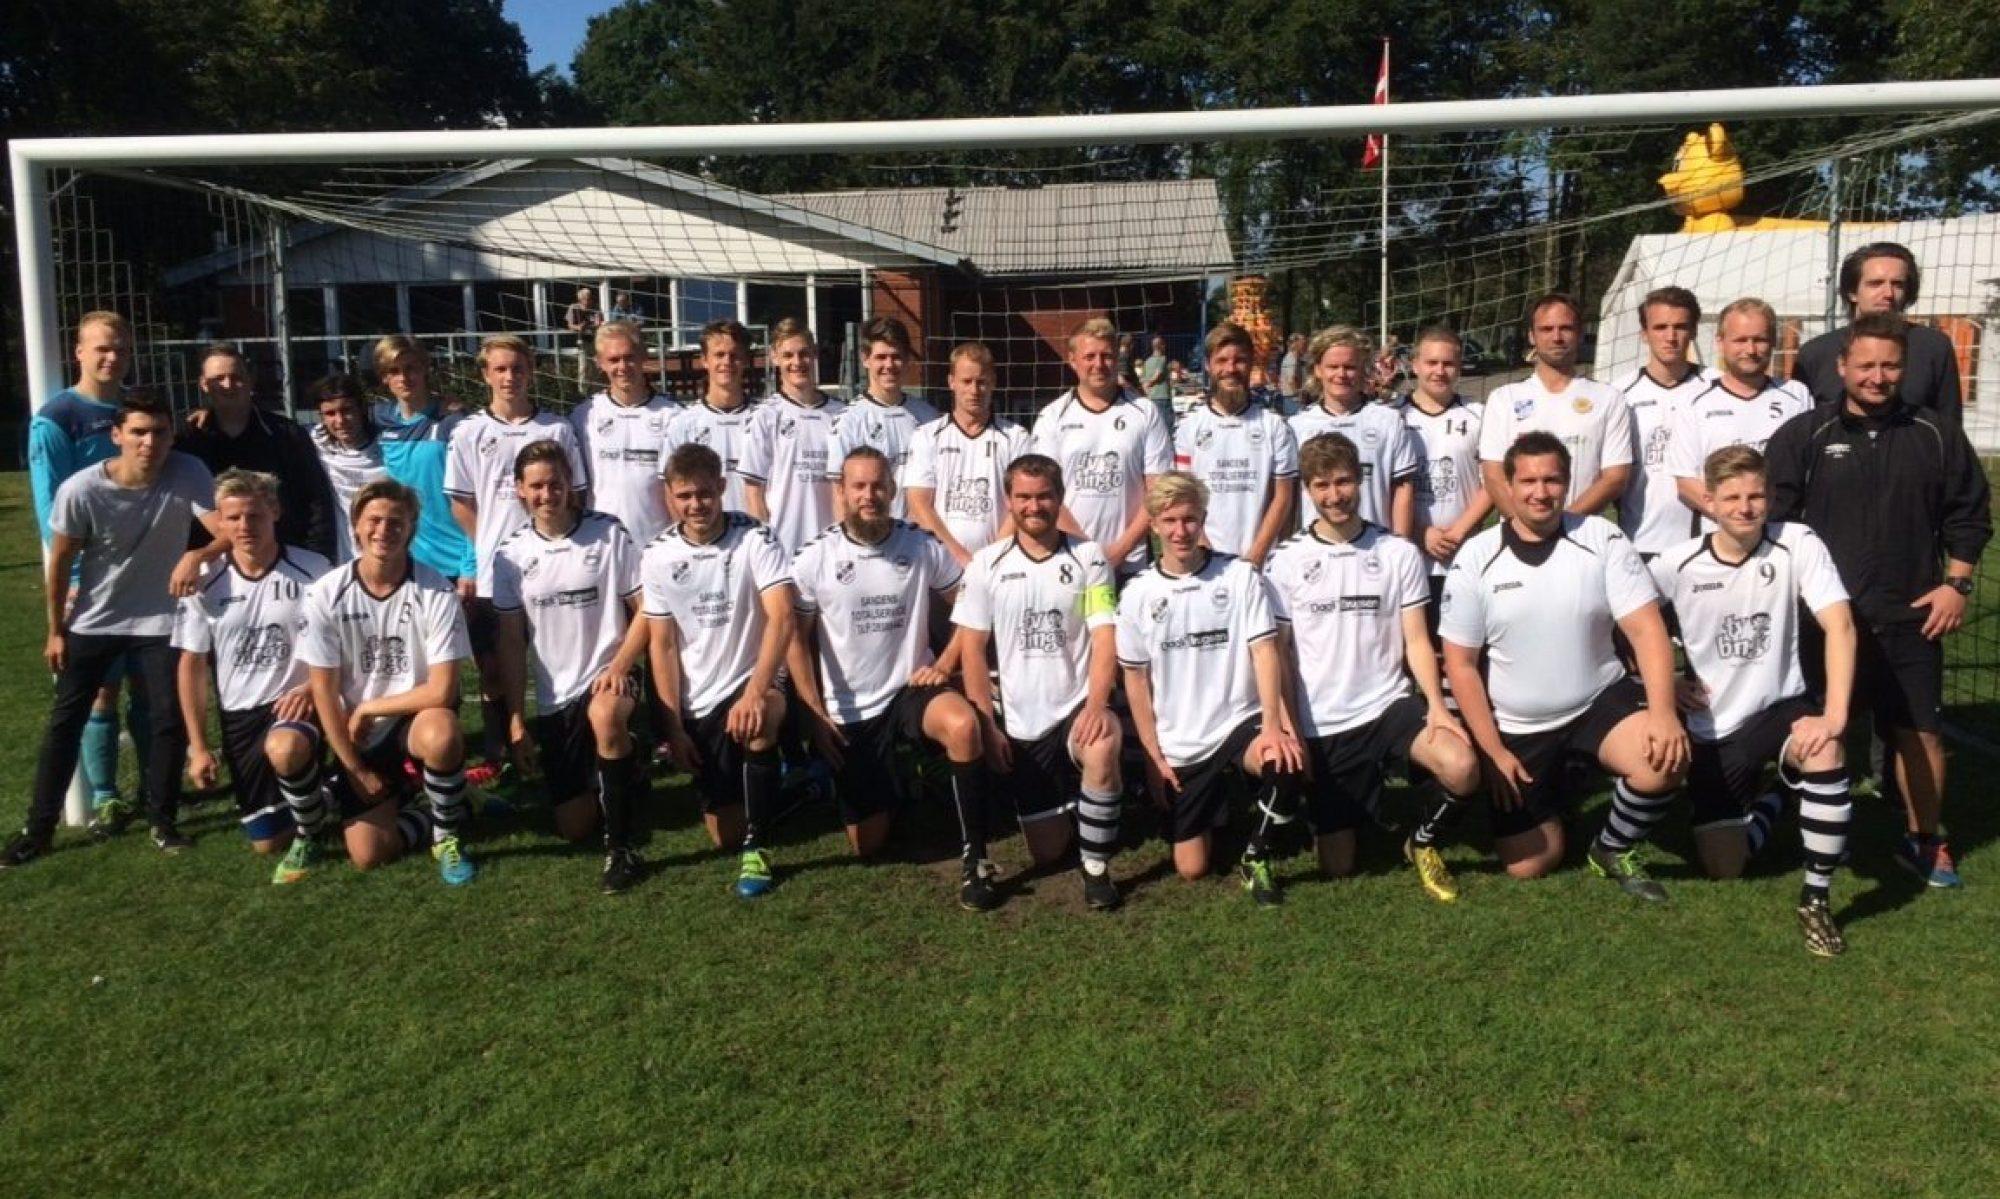 Gandrup Sportsklub